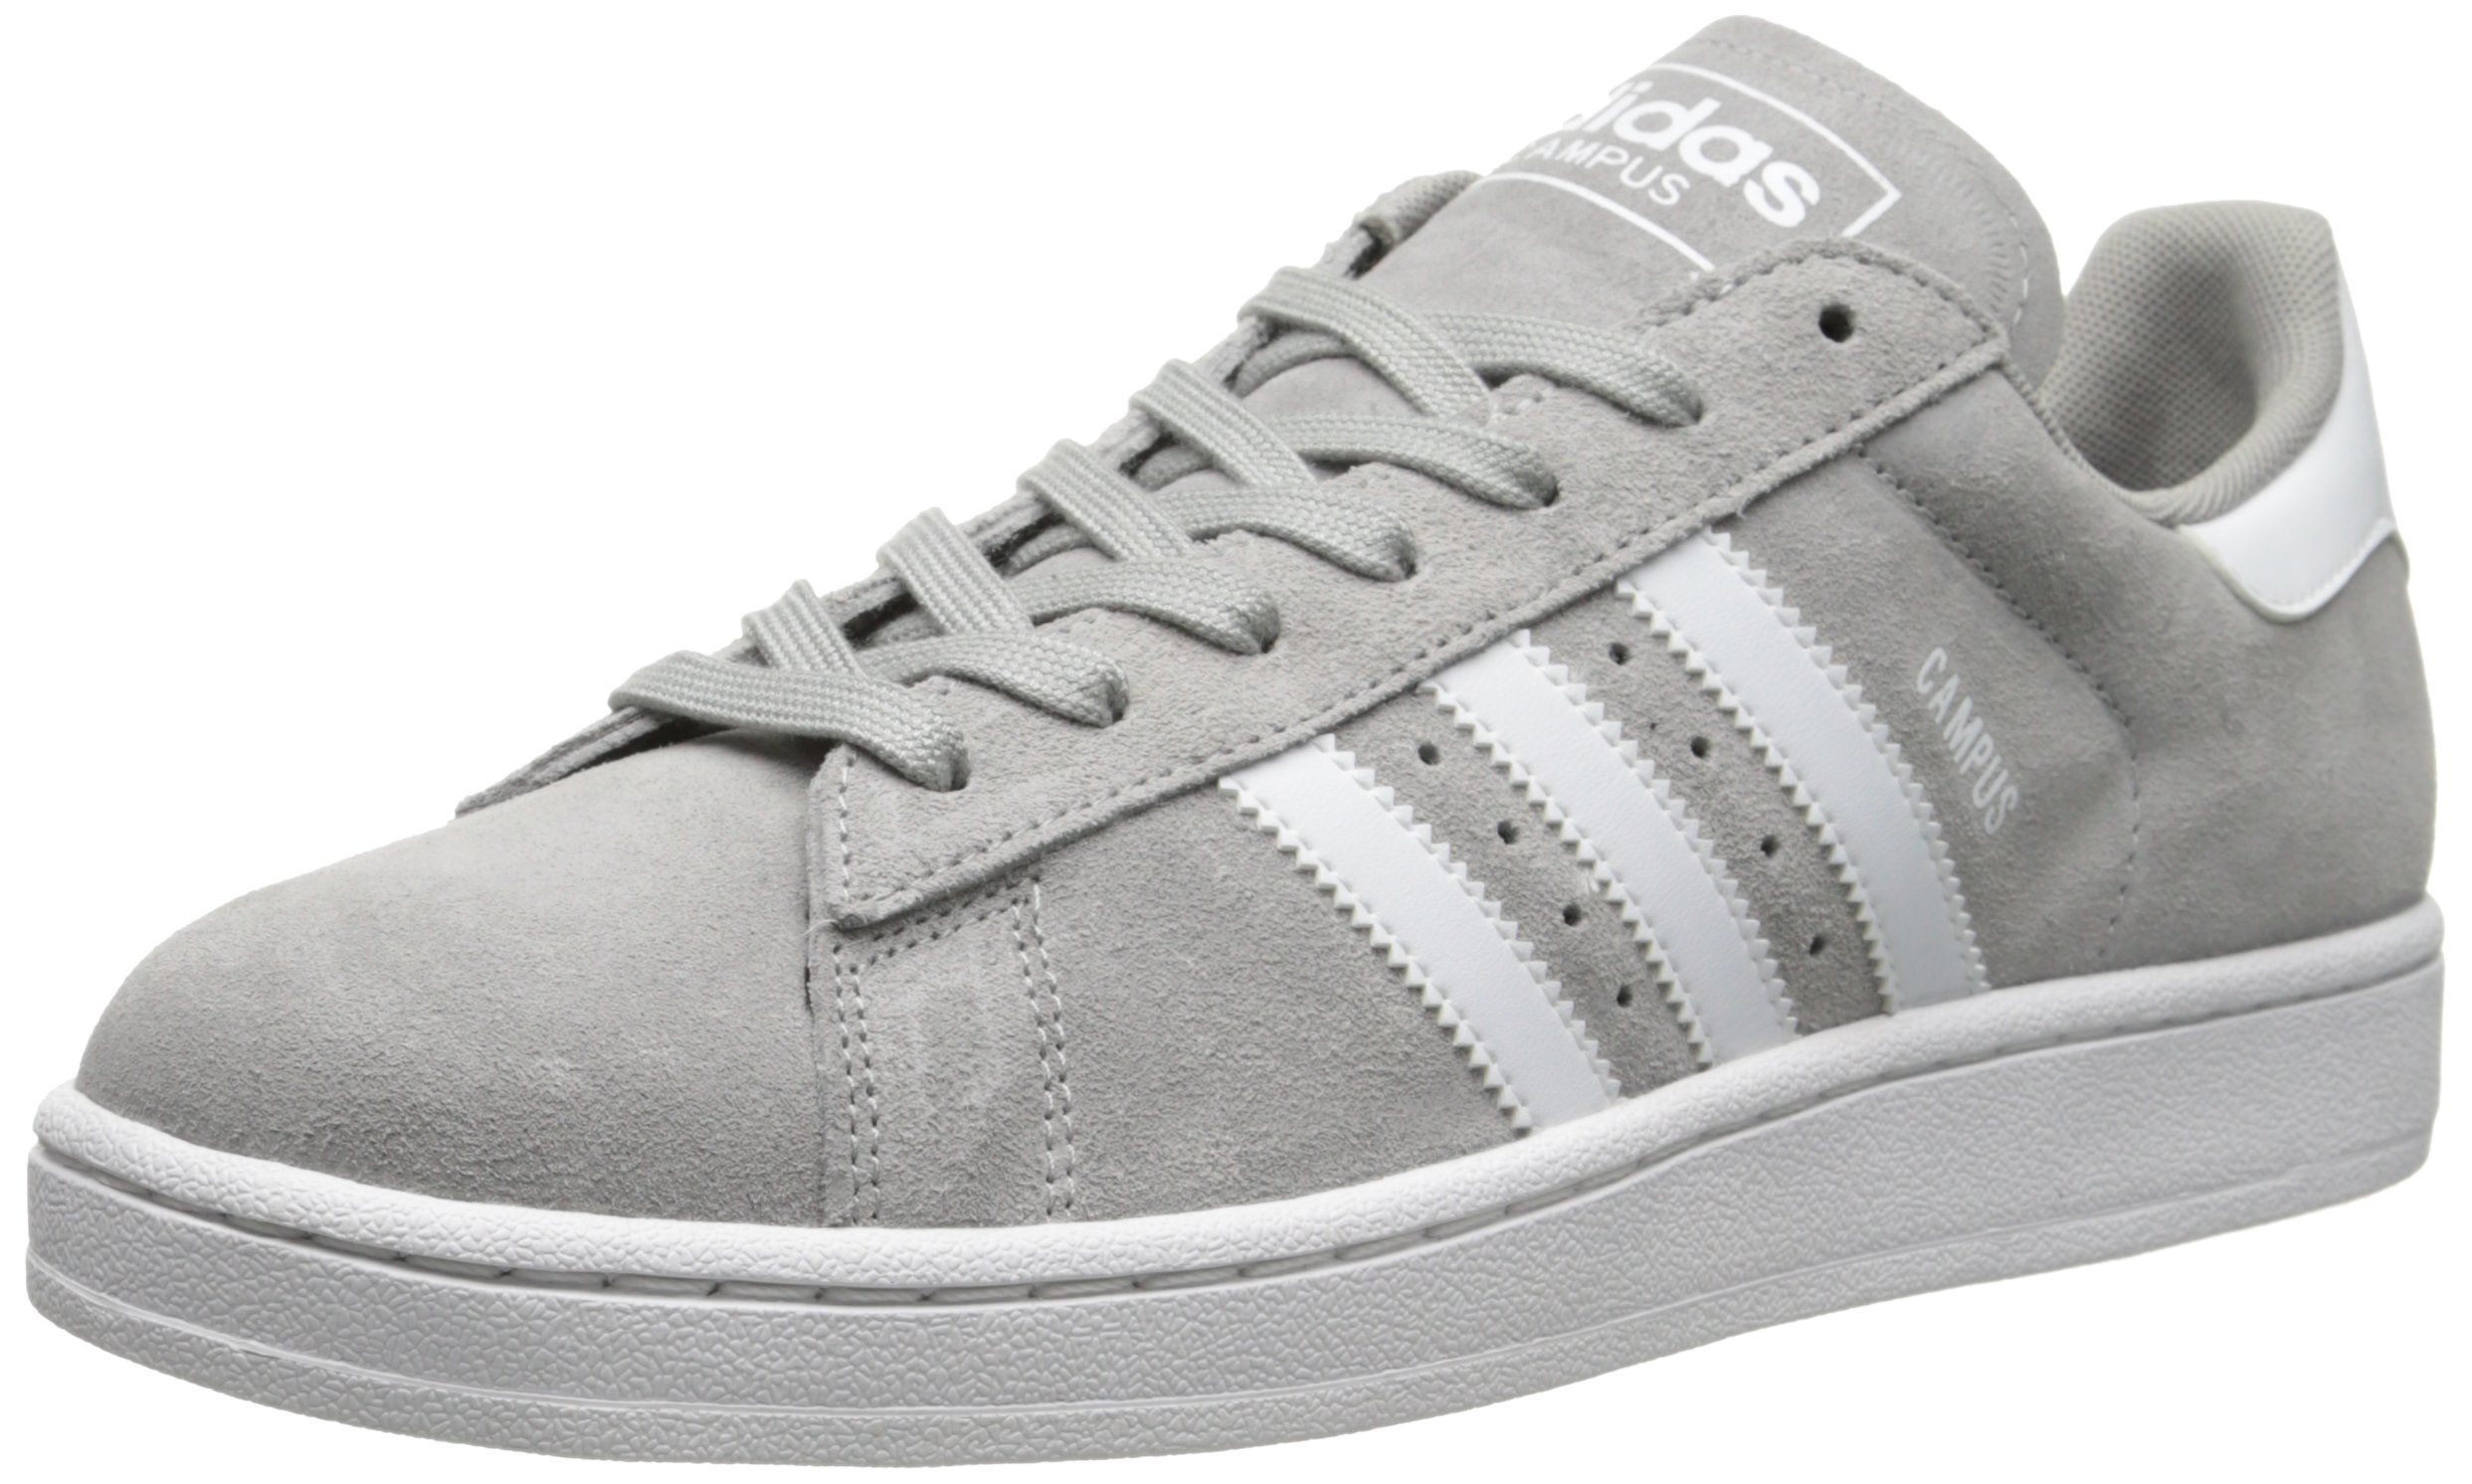 adidas Originals Men's Campus 2 Lifestyle Basketball Shoe, Solid Grey/Running  White/Solid